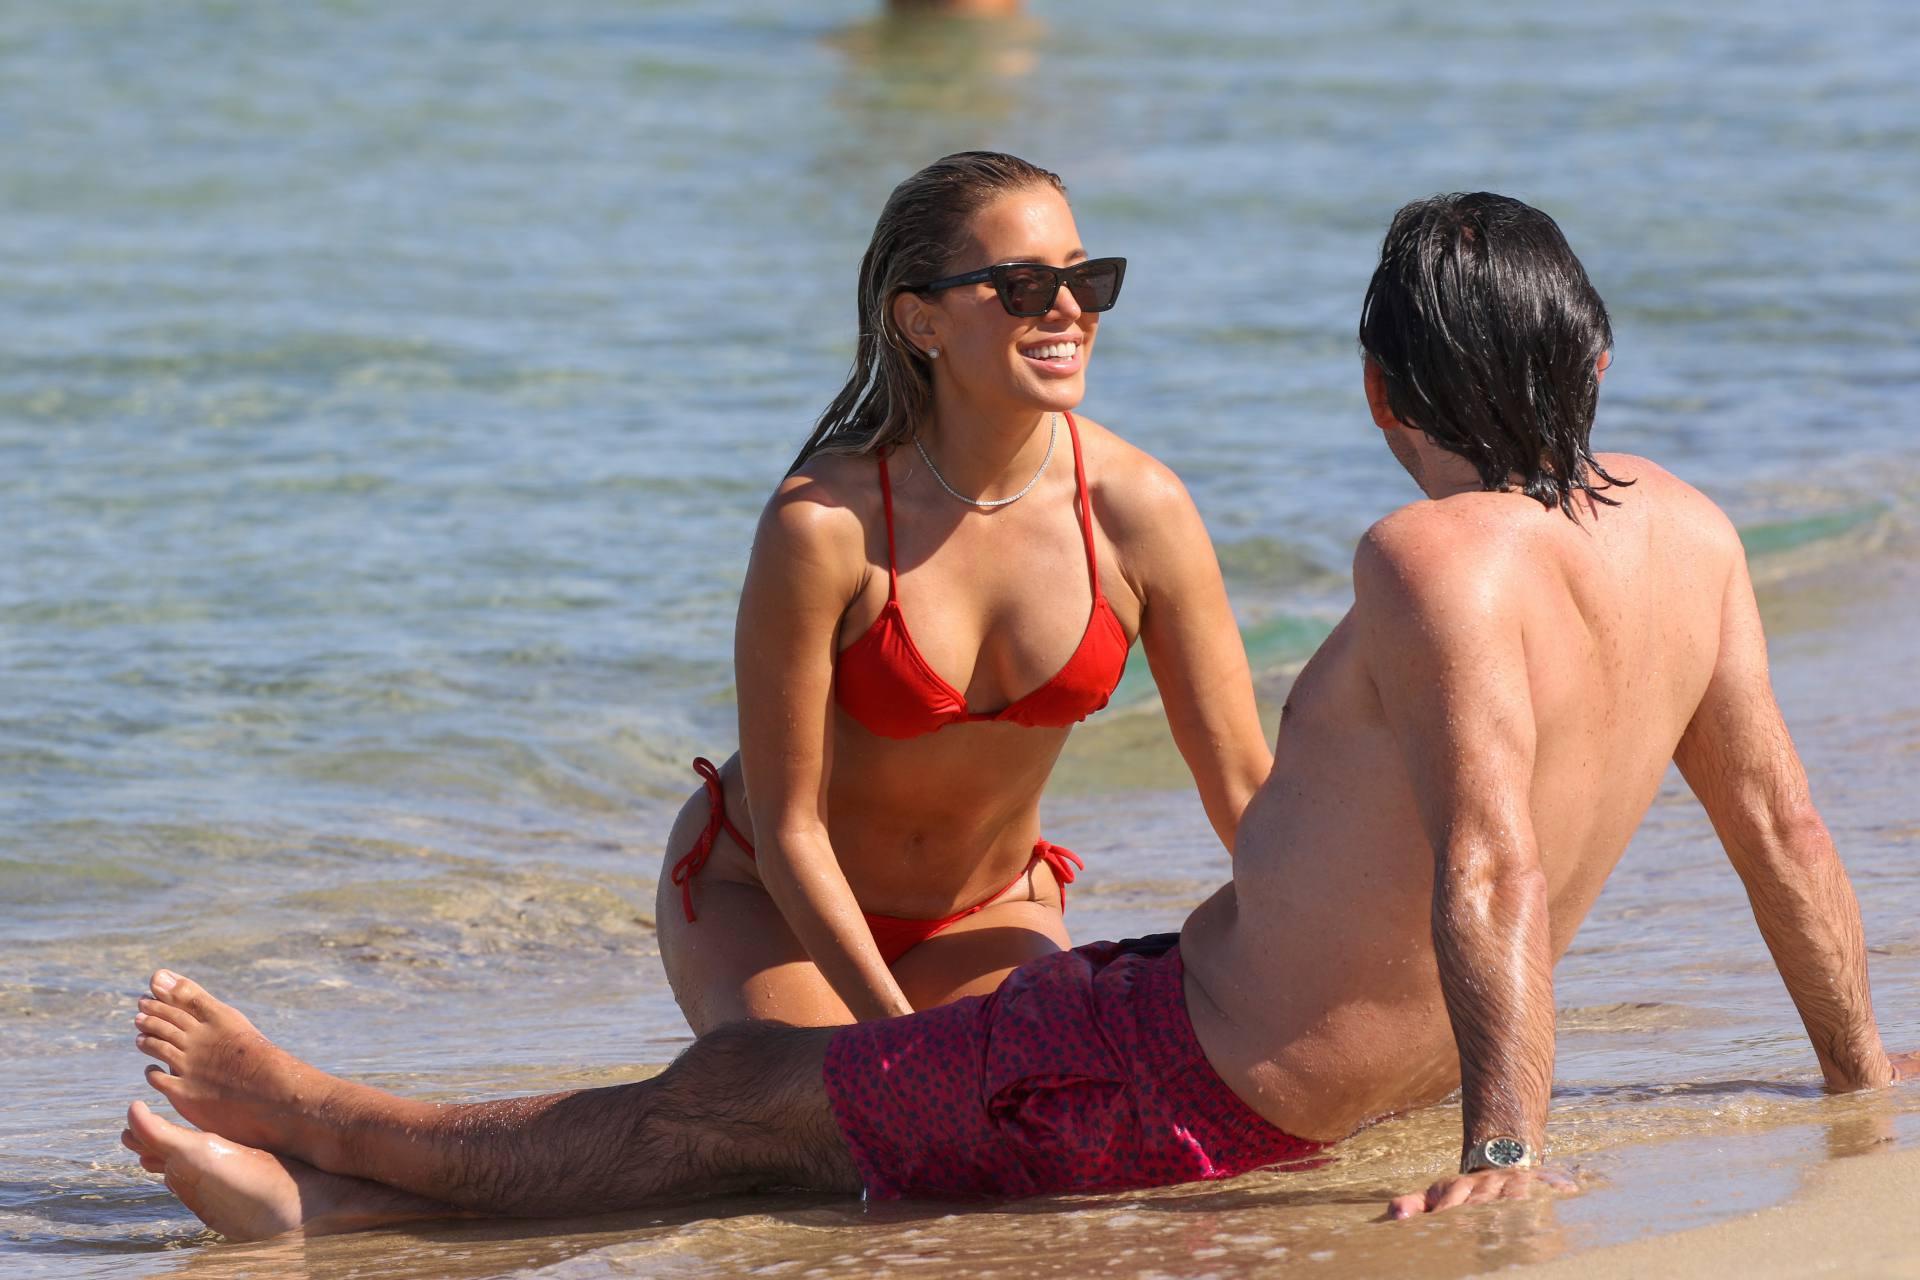 Sylvie Meis – Beautiful Body In Sexy Bikini On The Beach In Saint Tropez 0026